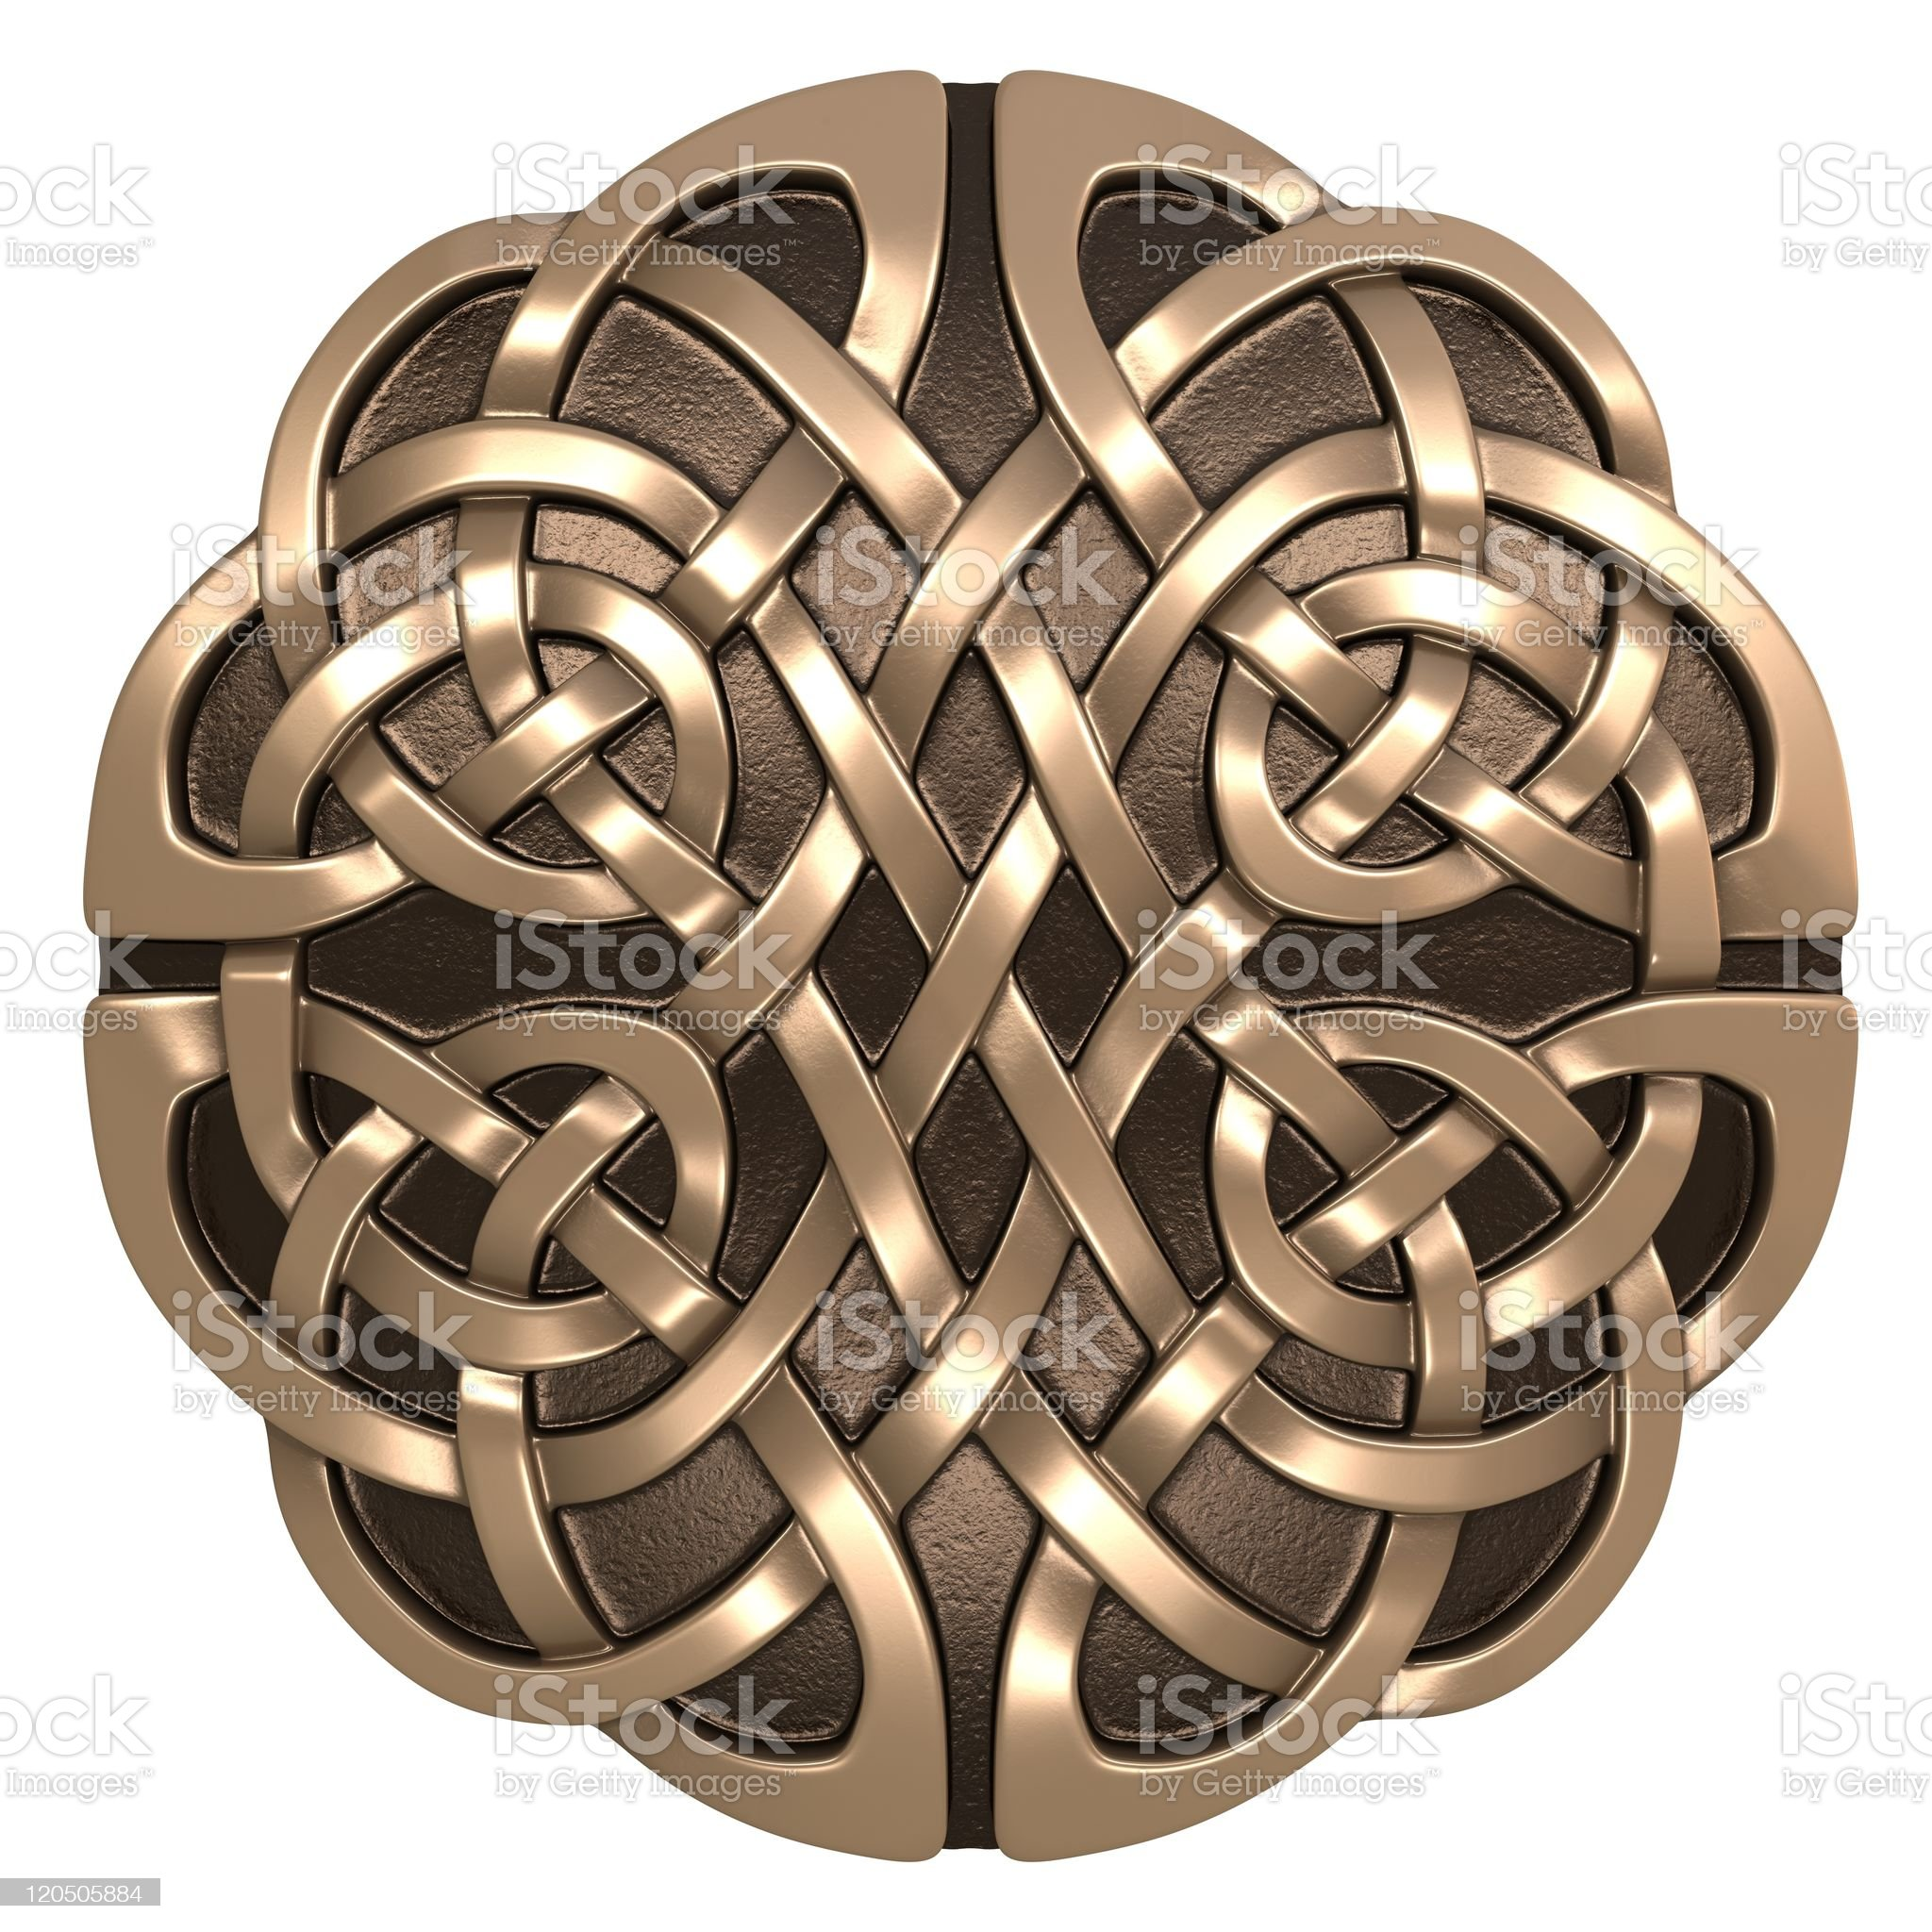 Celtic ornament royalty-free stock photo